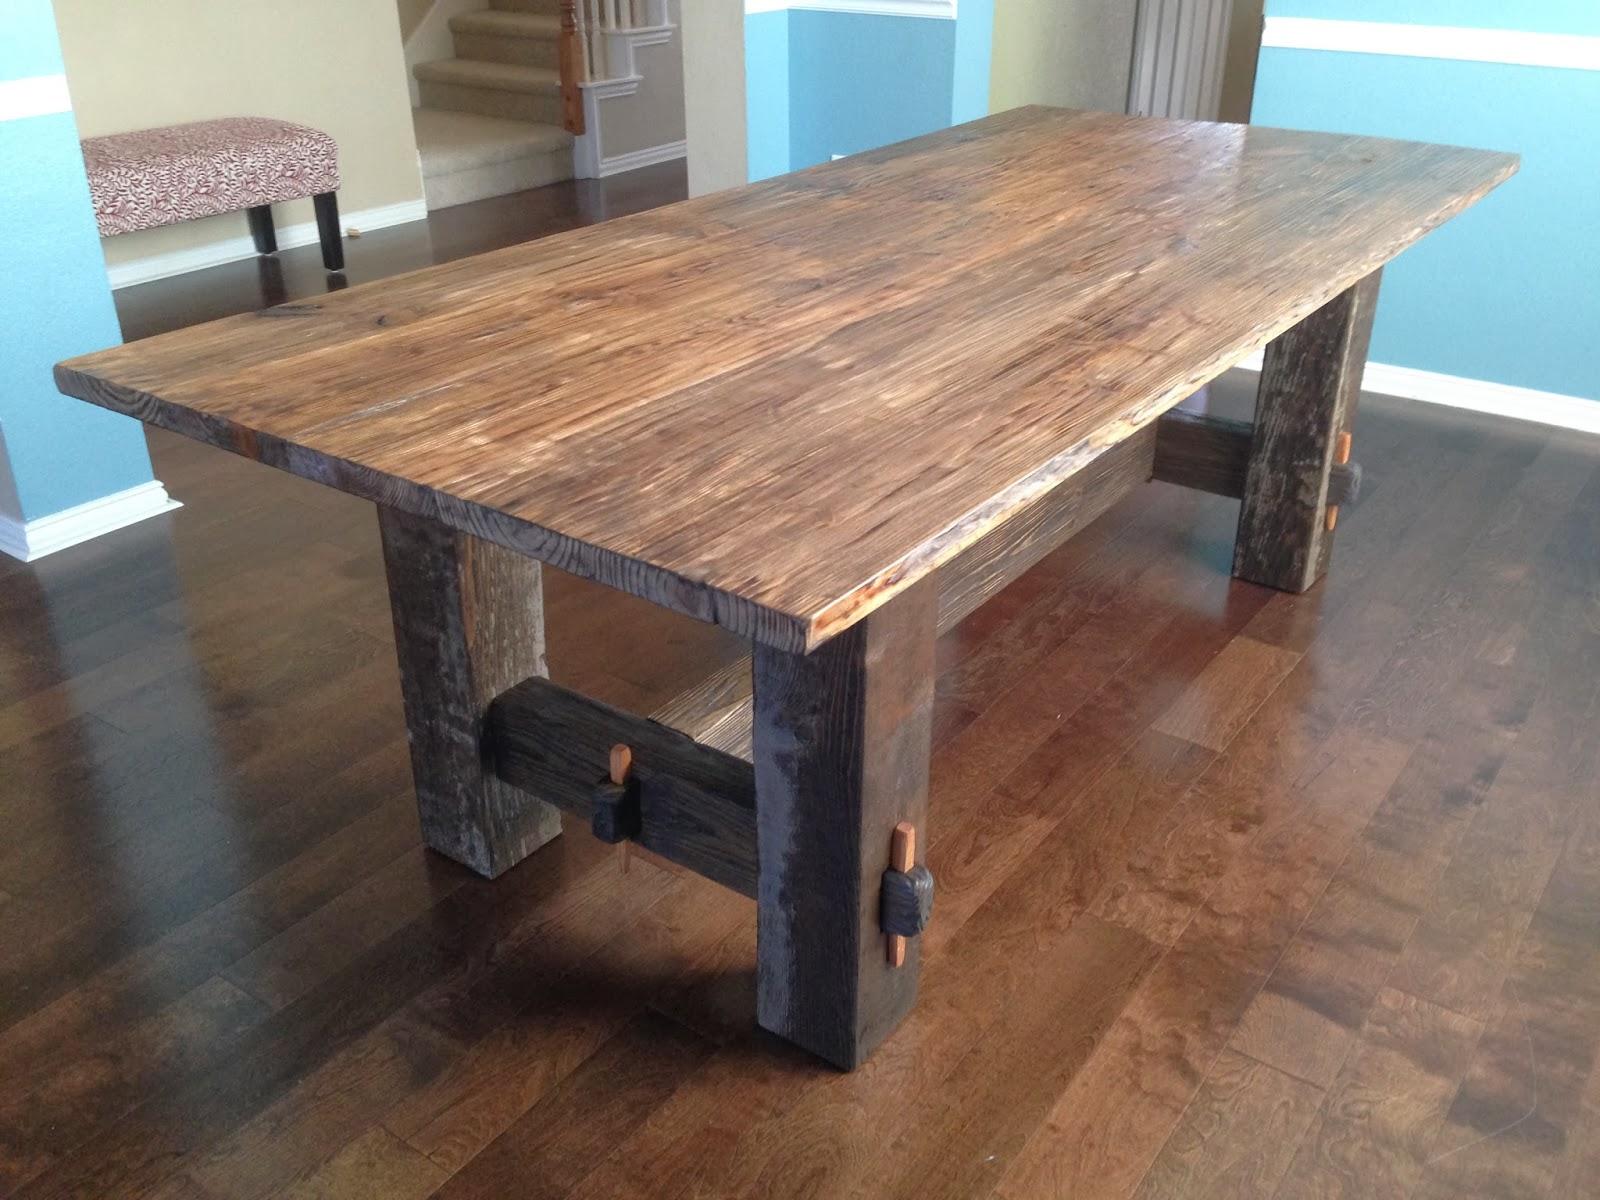 Rock Solid Tables: The Holman Farmhouse Table: $1400 ...